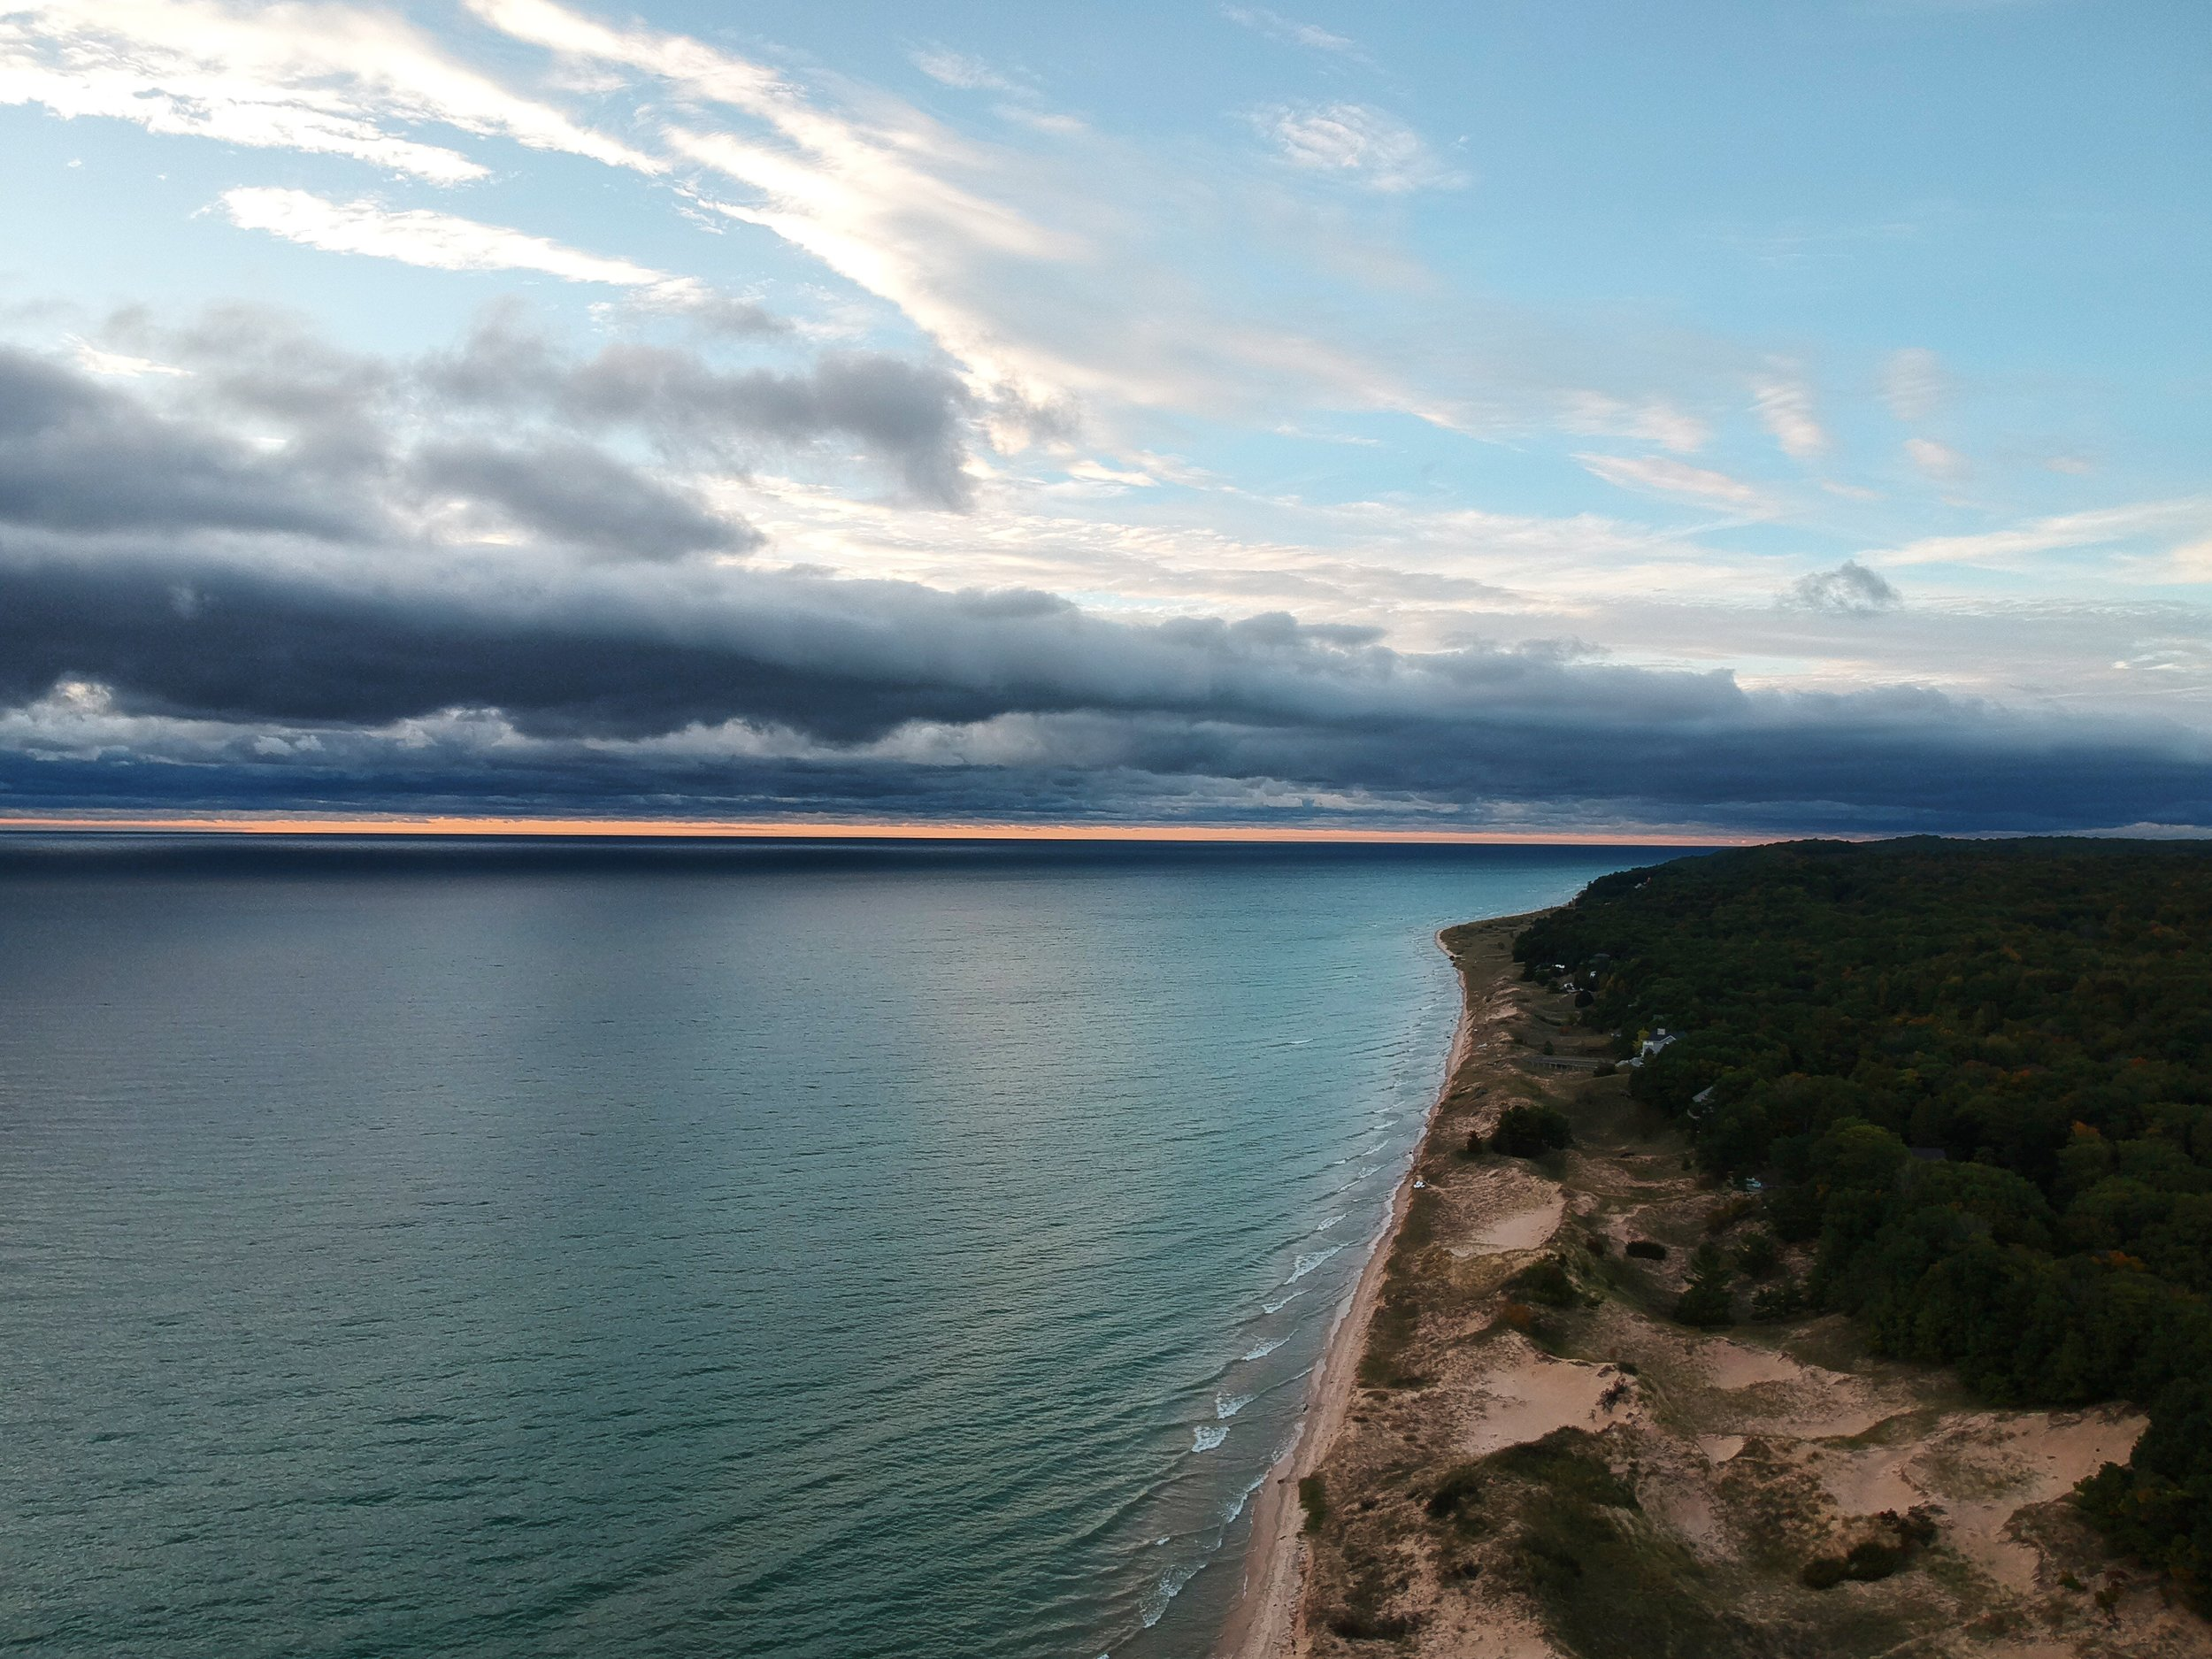 lake-michigan-lakeshore